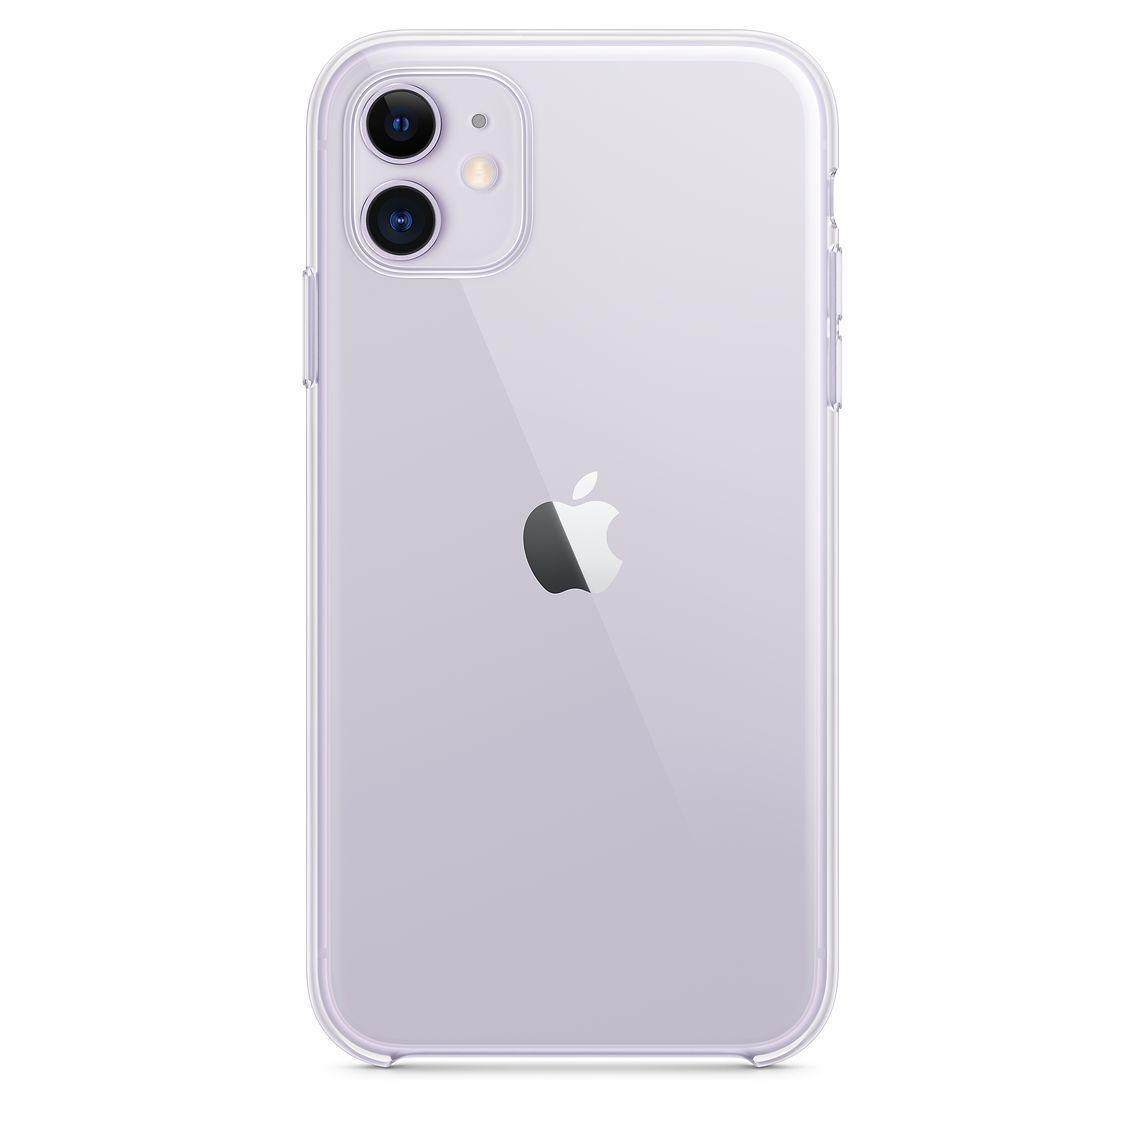 PChome24h購物9月20日上午8點準時開賣iPhone11系列,全機種備貨...